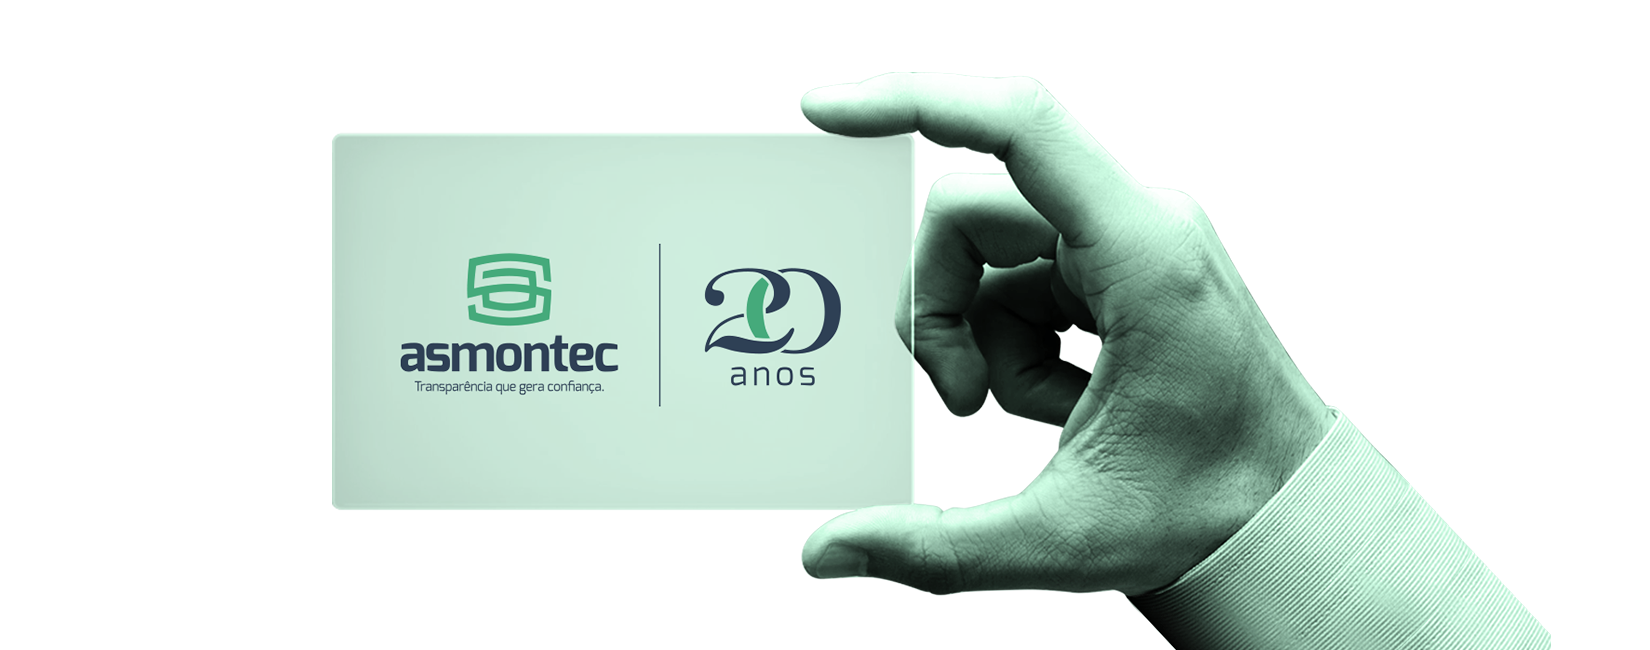 Blog da Asmontec